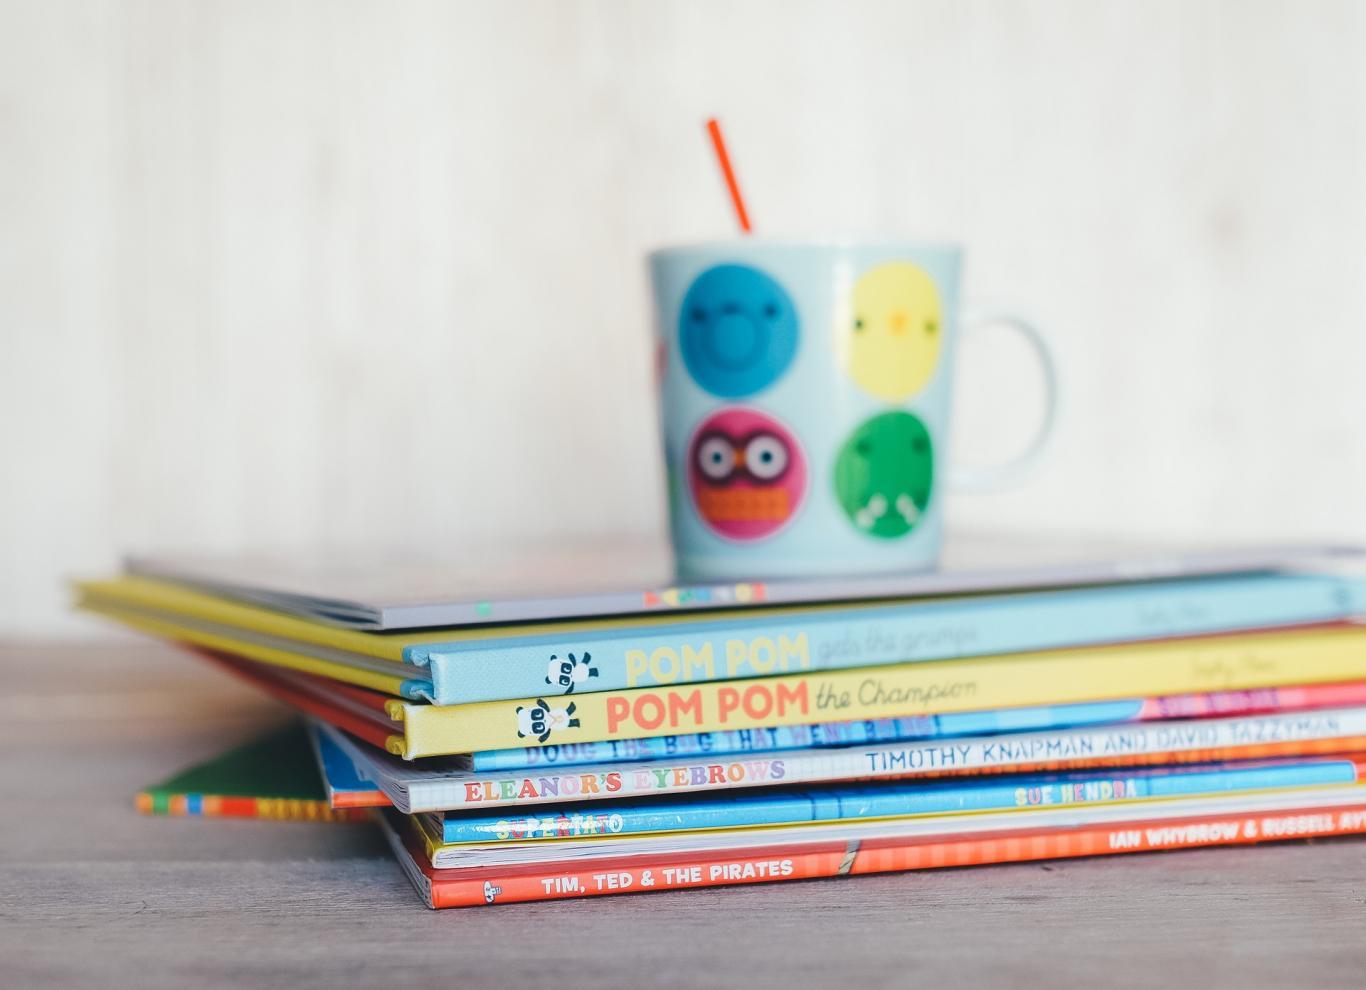 Casos de absentismo escolar comunicados por el centro docente